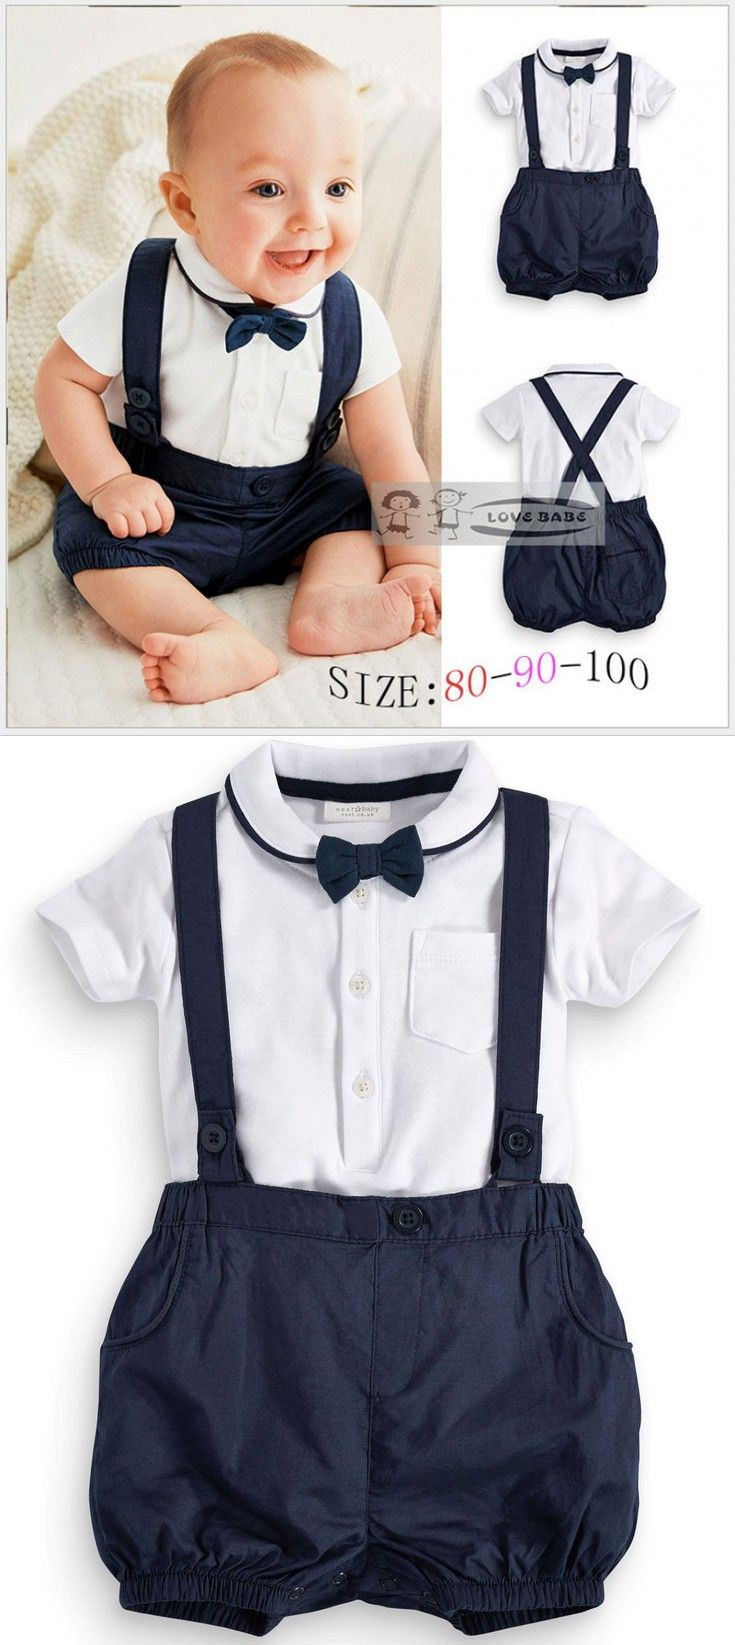 baby suit summer baby clothing cotton 2pcs suit short infant boy gentleman suspender  gift fjuopky